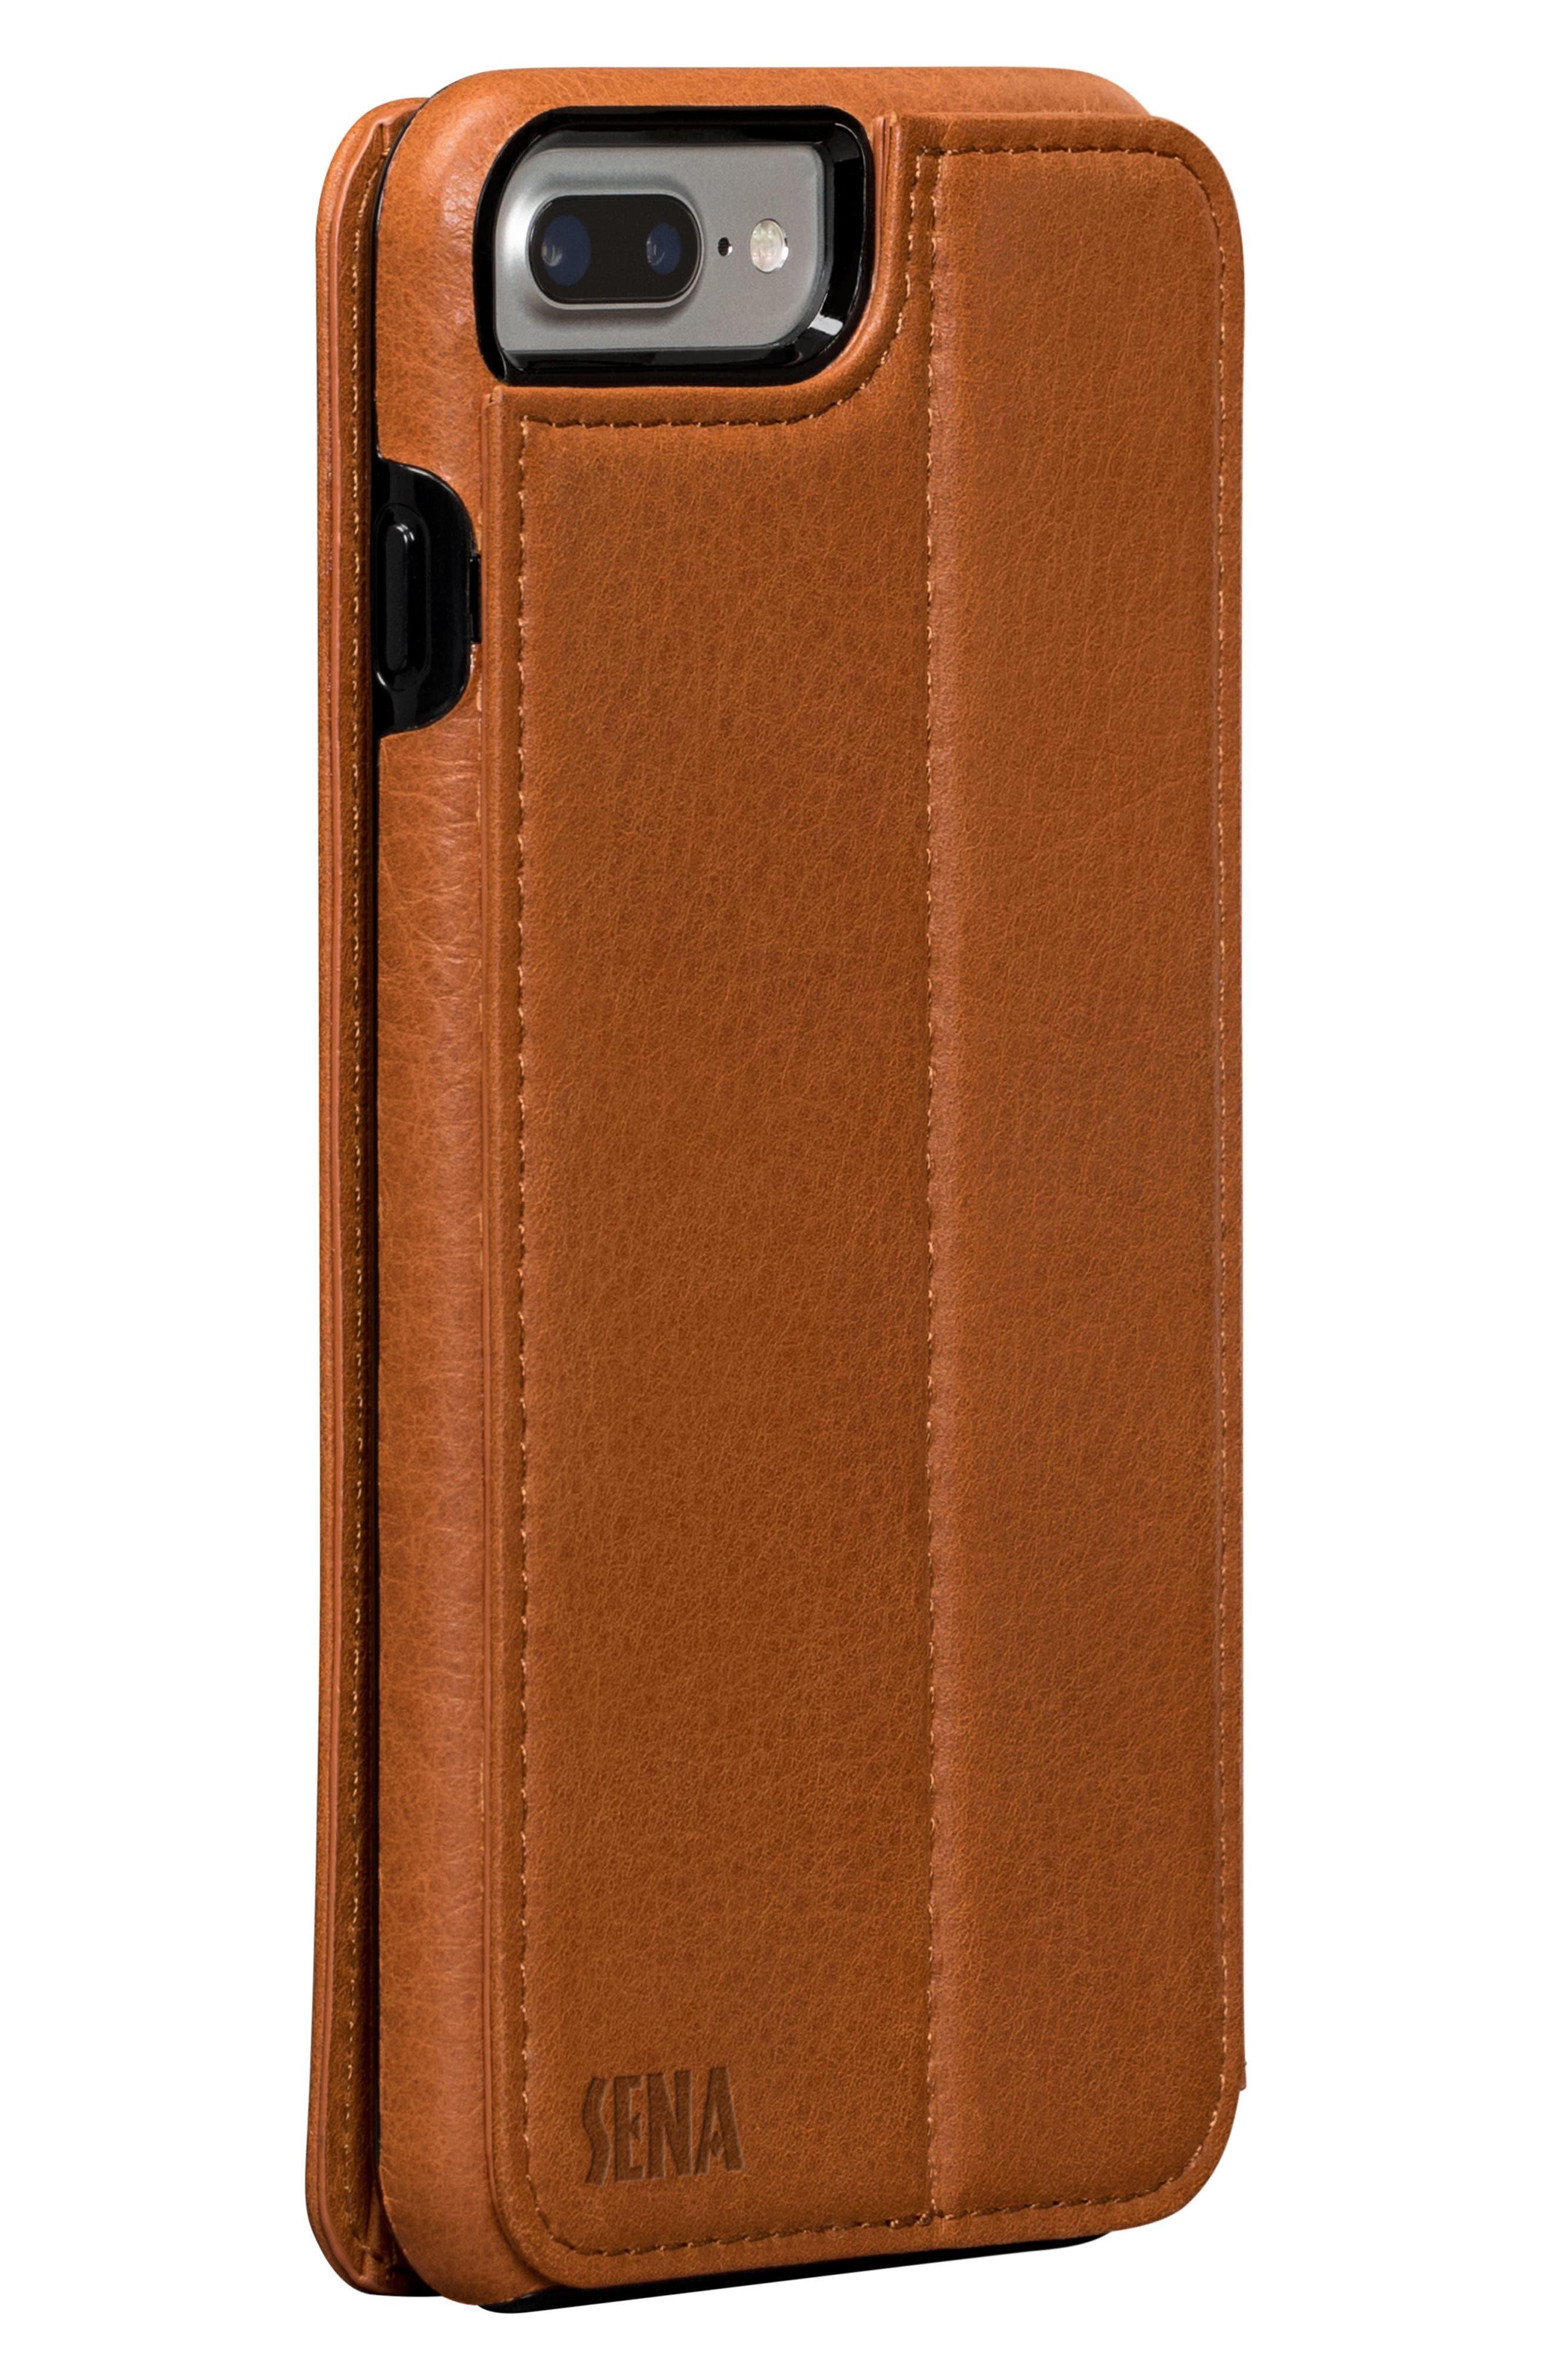 Bence iPhone 7/8 Plus Walletbook,                             Alternate thumbnail 3, color,                             SADDLE